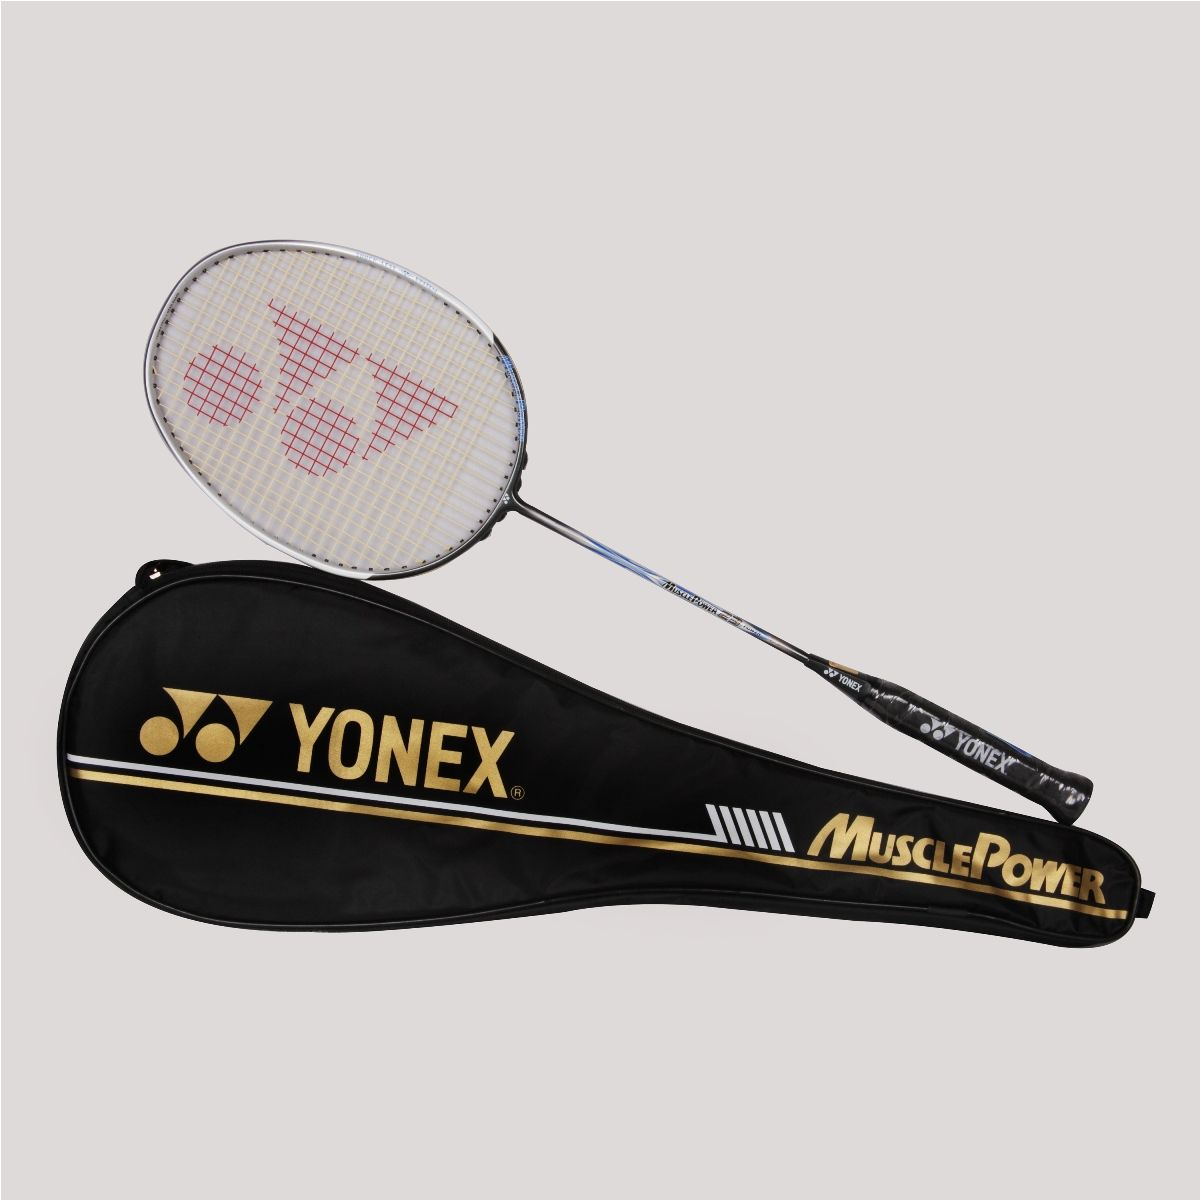 Yonex Muscle Power 23 Pwr Badminton Racket White Black Price 5389 With Images Badminton Racket Online Sports Store Badminton